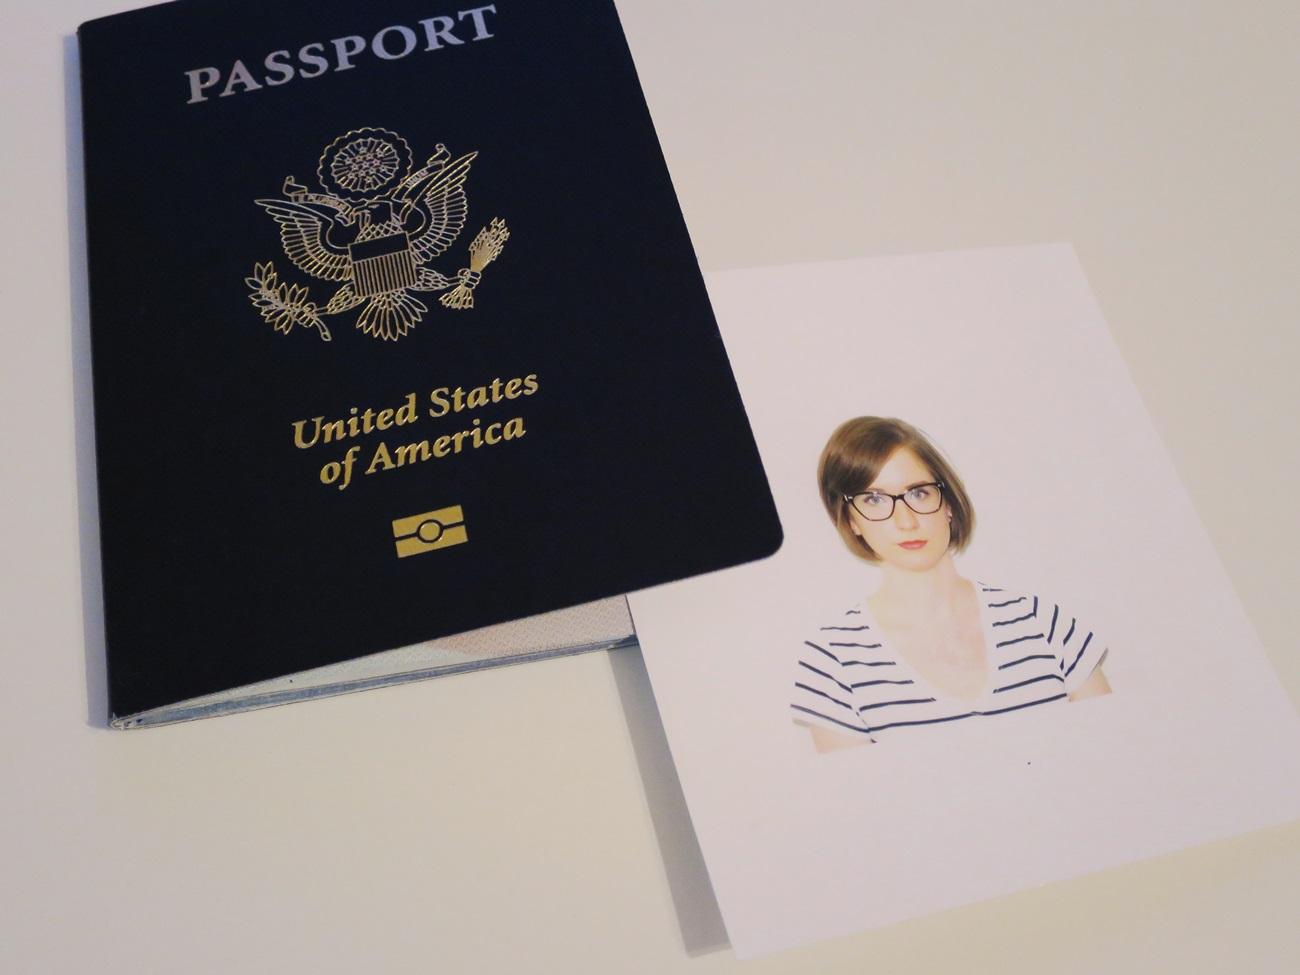 Best way to get a passport photo Crinoline - Wikipedia